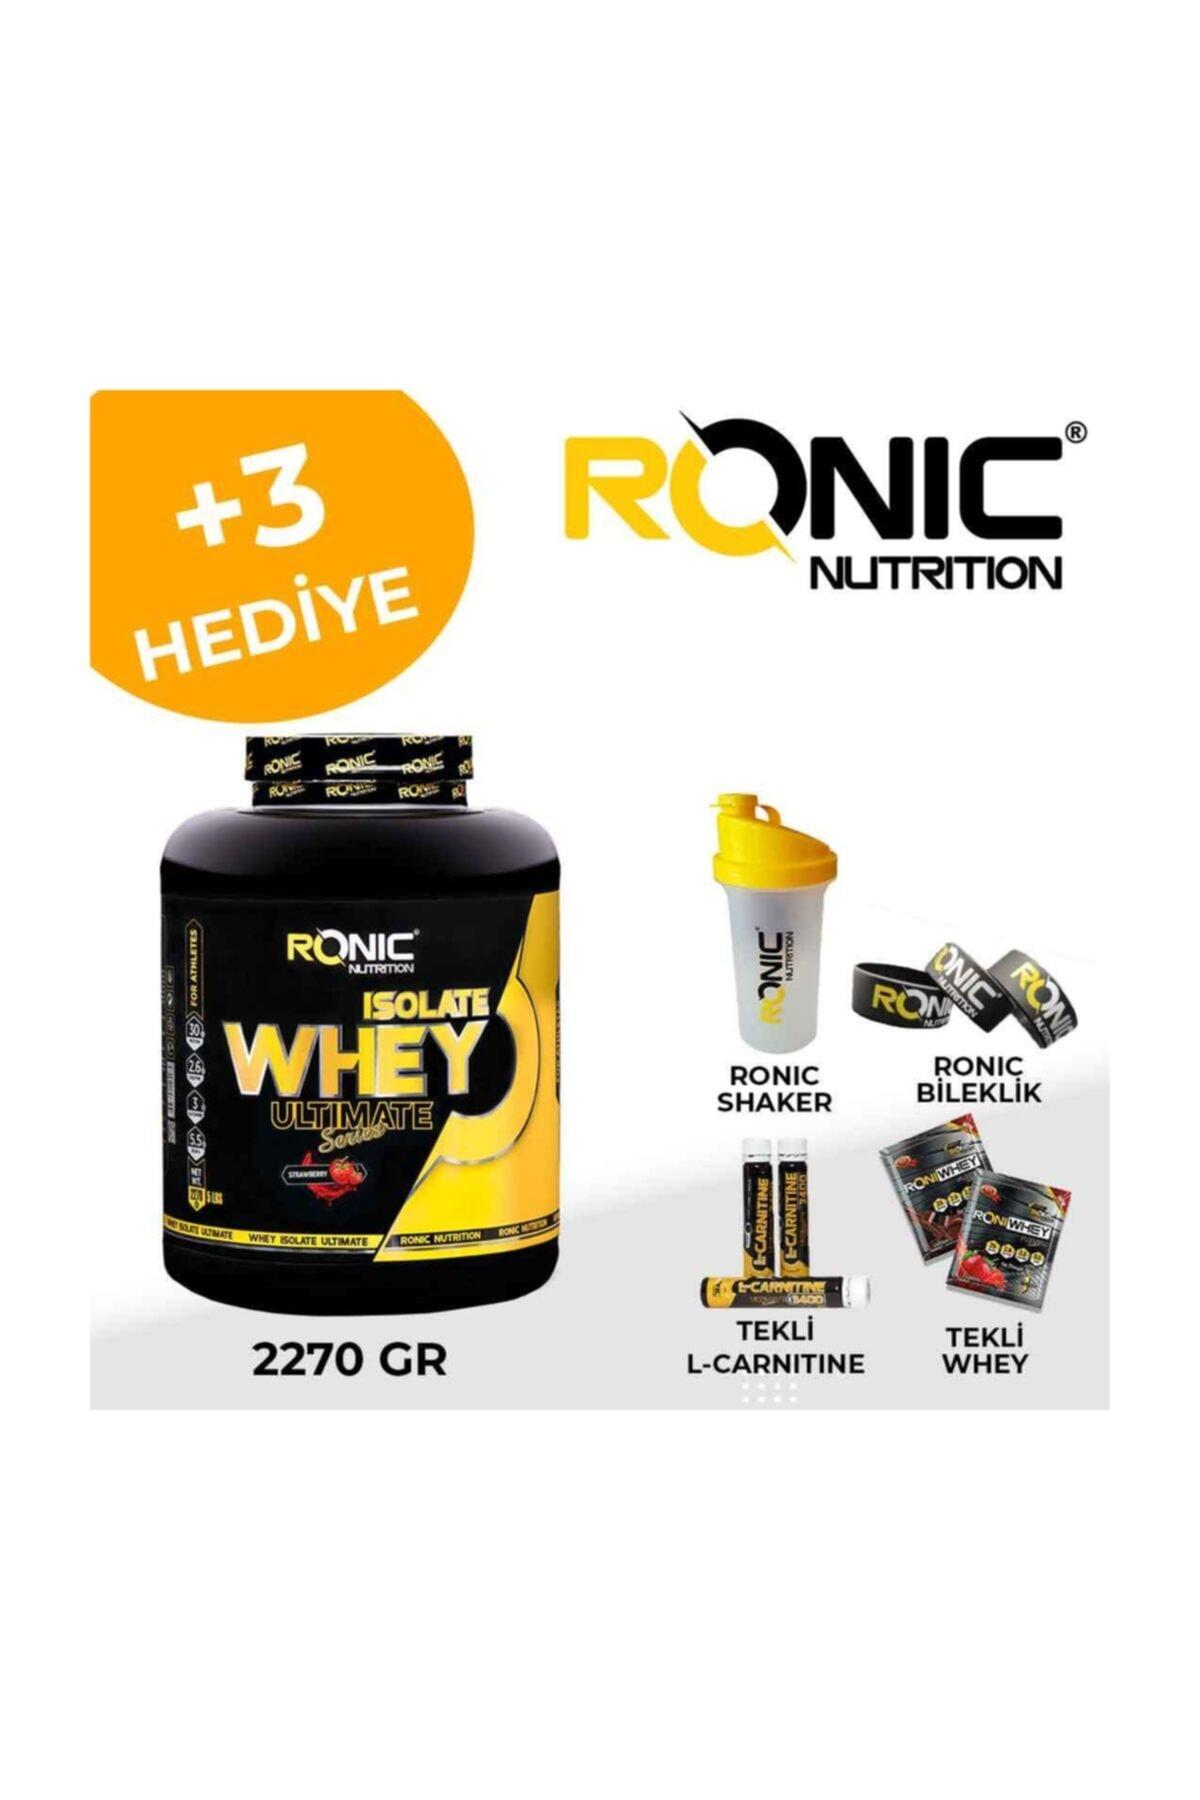 Ronic Nutrition Whey İsolate Protein Tozu Çilek Aromalı 2270 Gr + 3 Adet Hediyeli 2